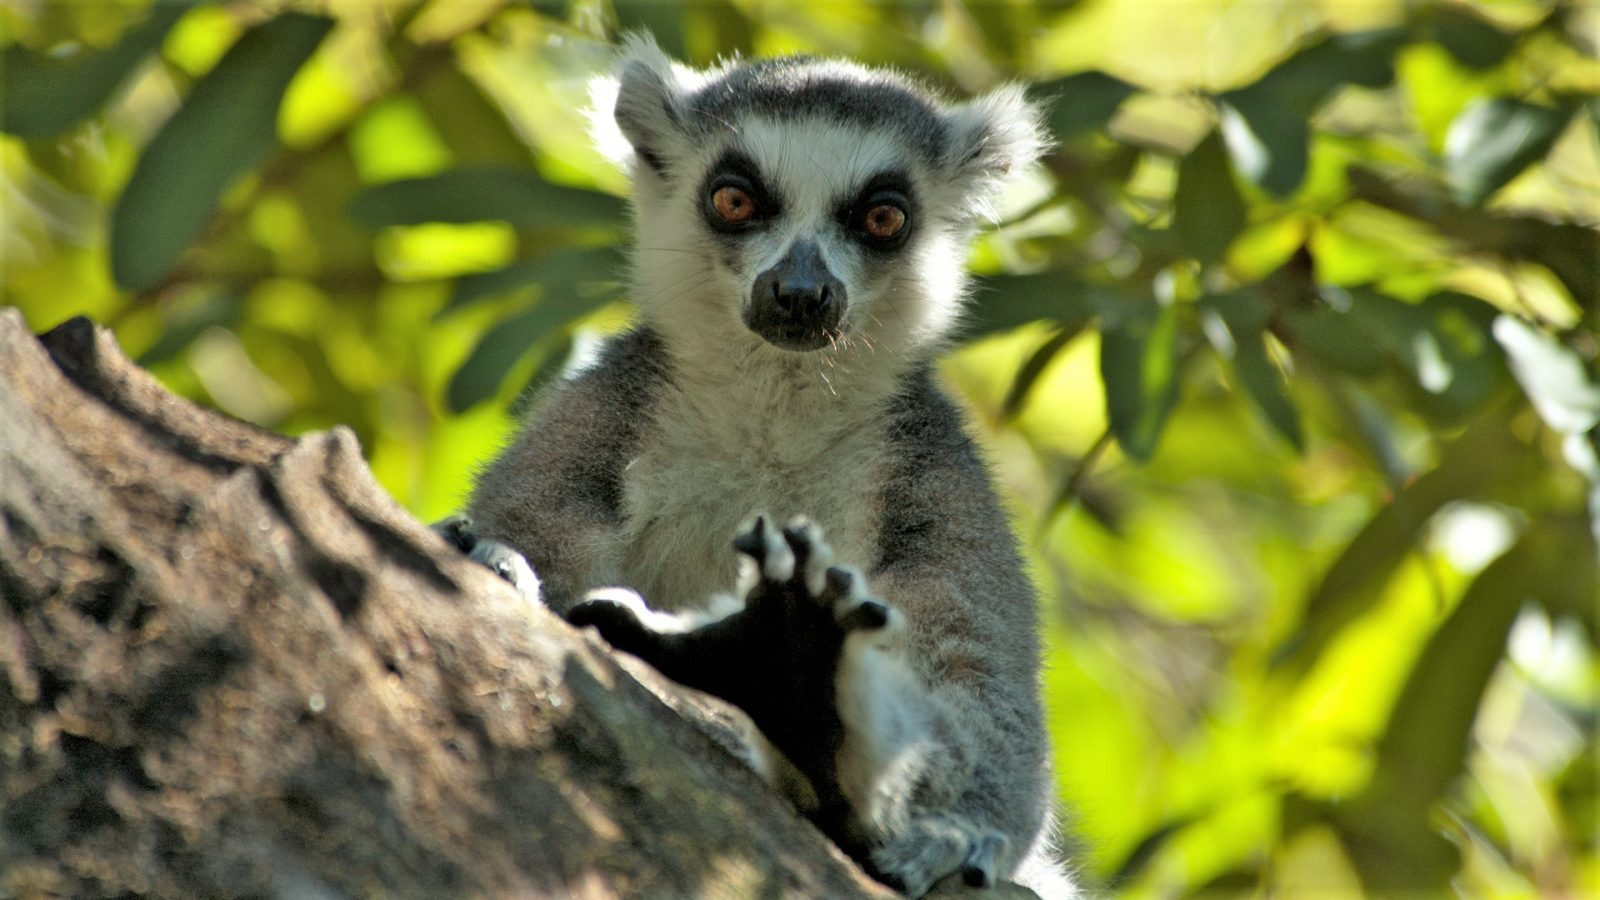 Wildlife Photographer - Lemurs in Madagascar